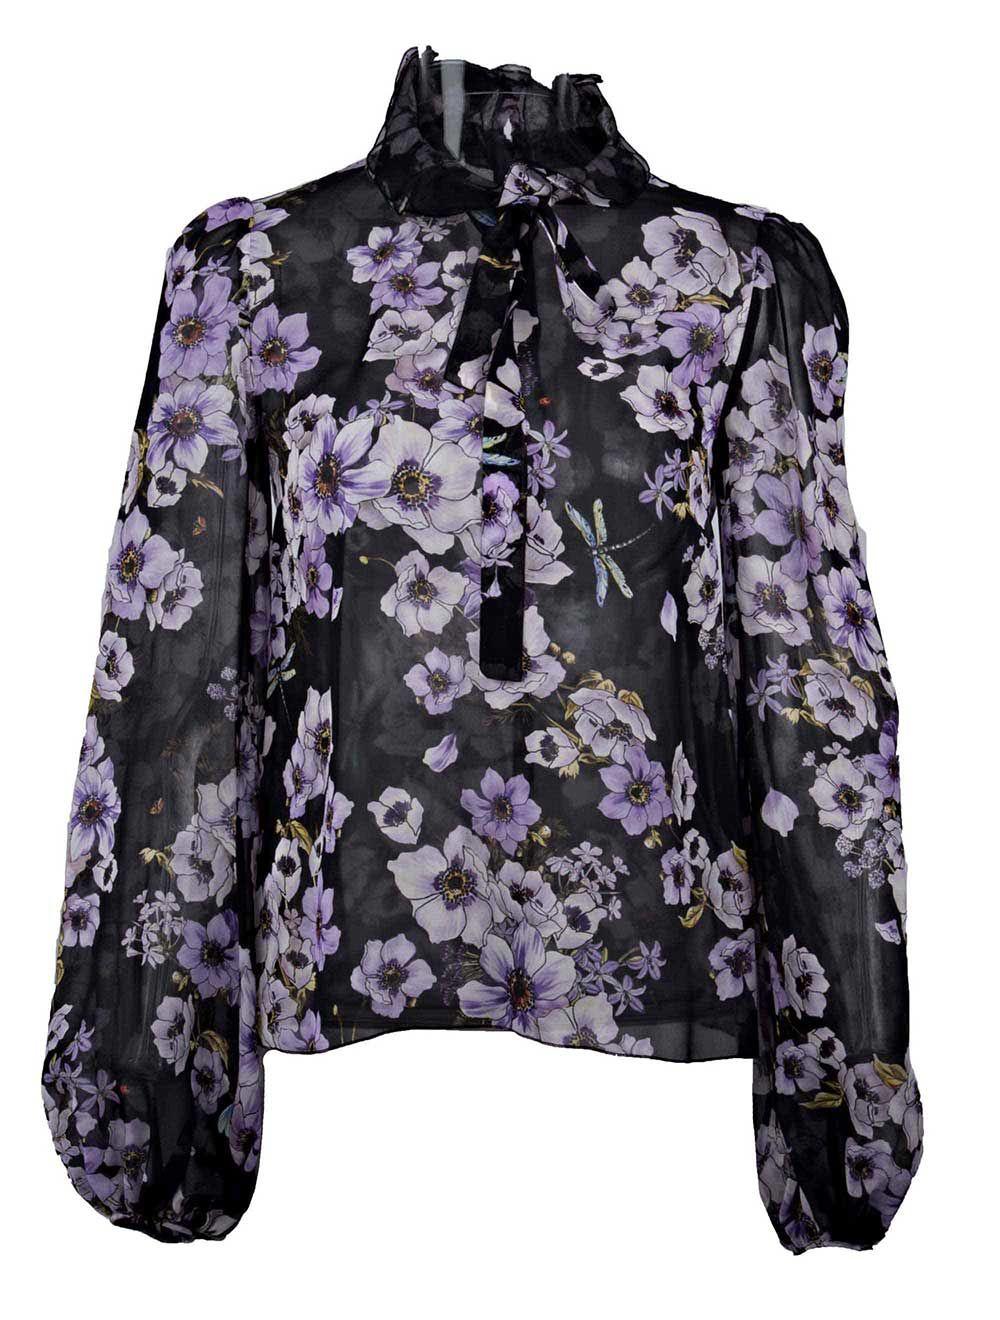 Giambattista Valli Floral Shirt